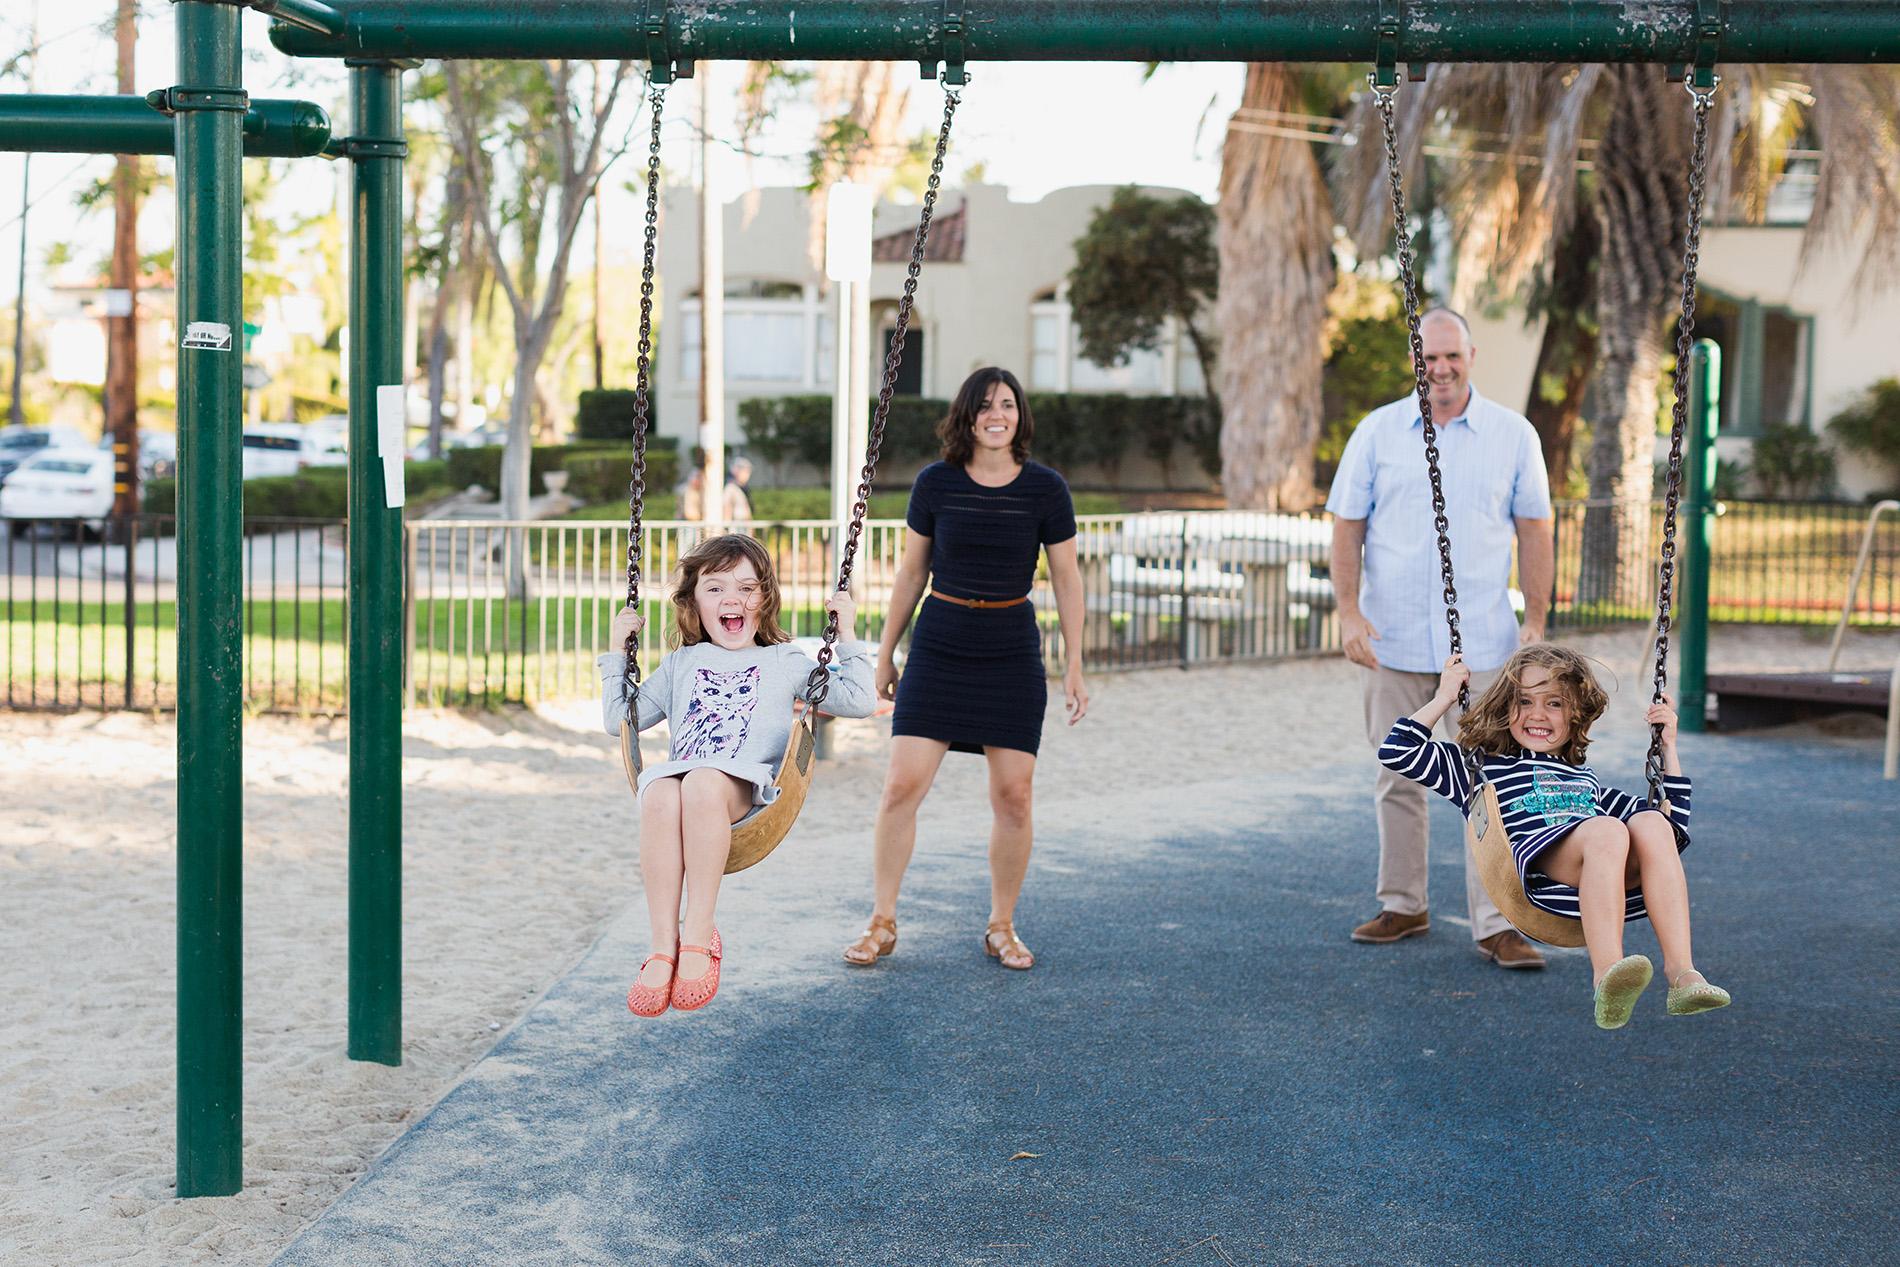 San.Diego.Family.Photographer.Christine.Dammann.Photography.Lifestyle.Blog.WS.7jpg